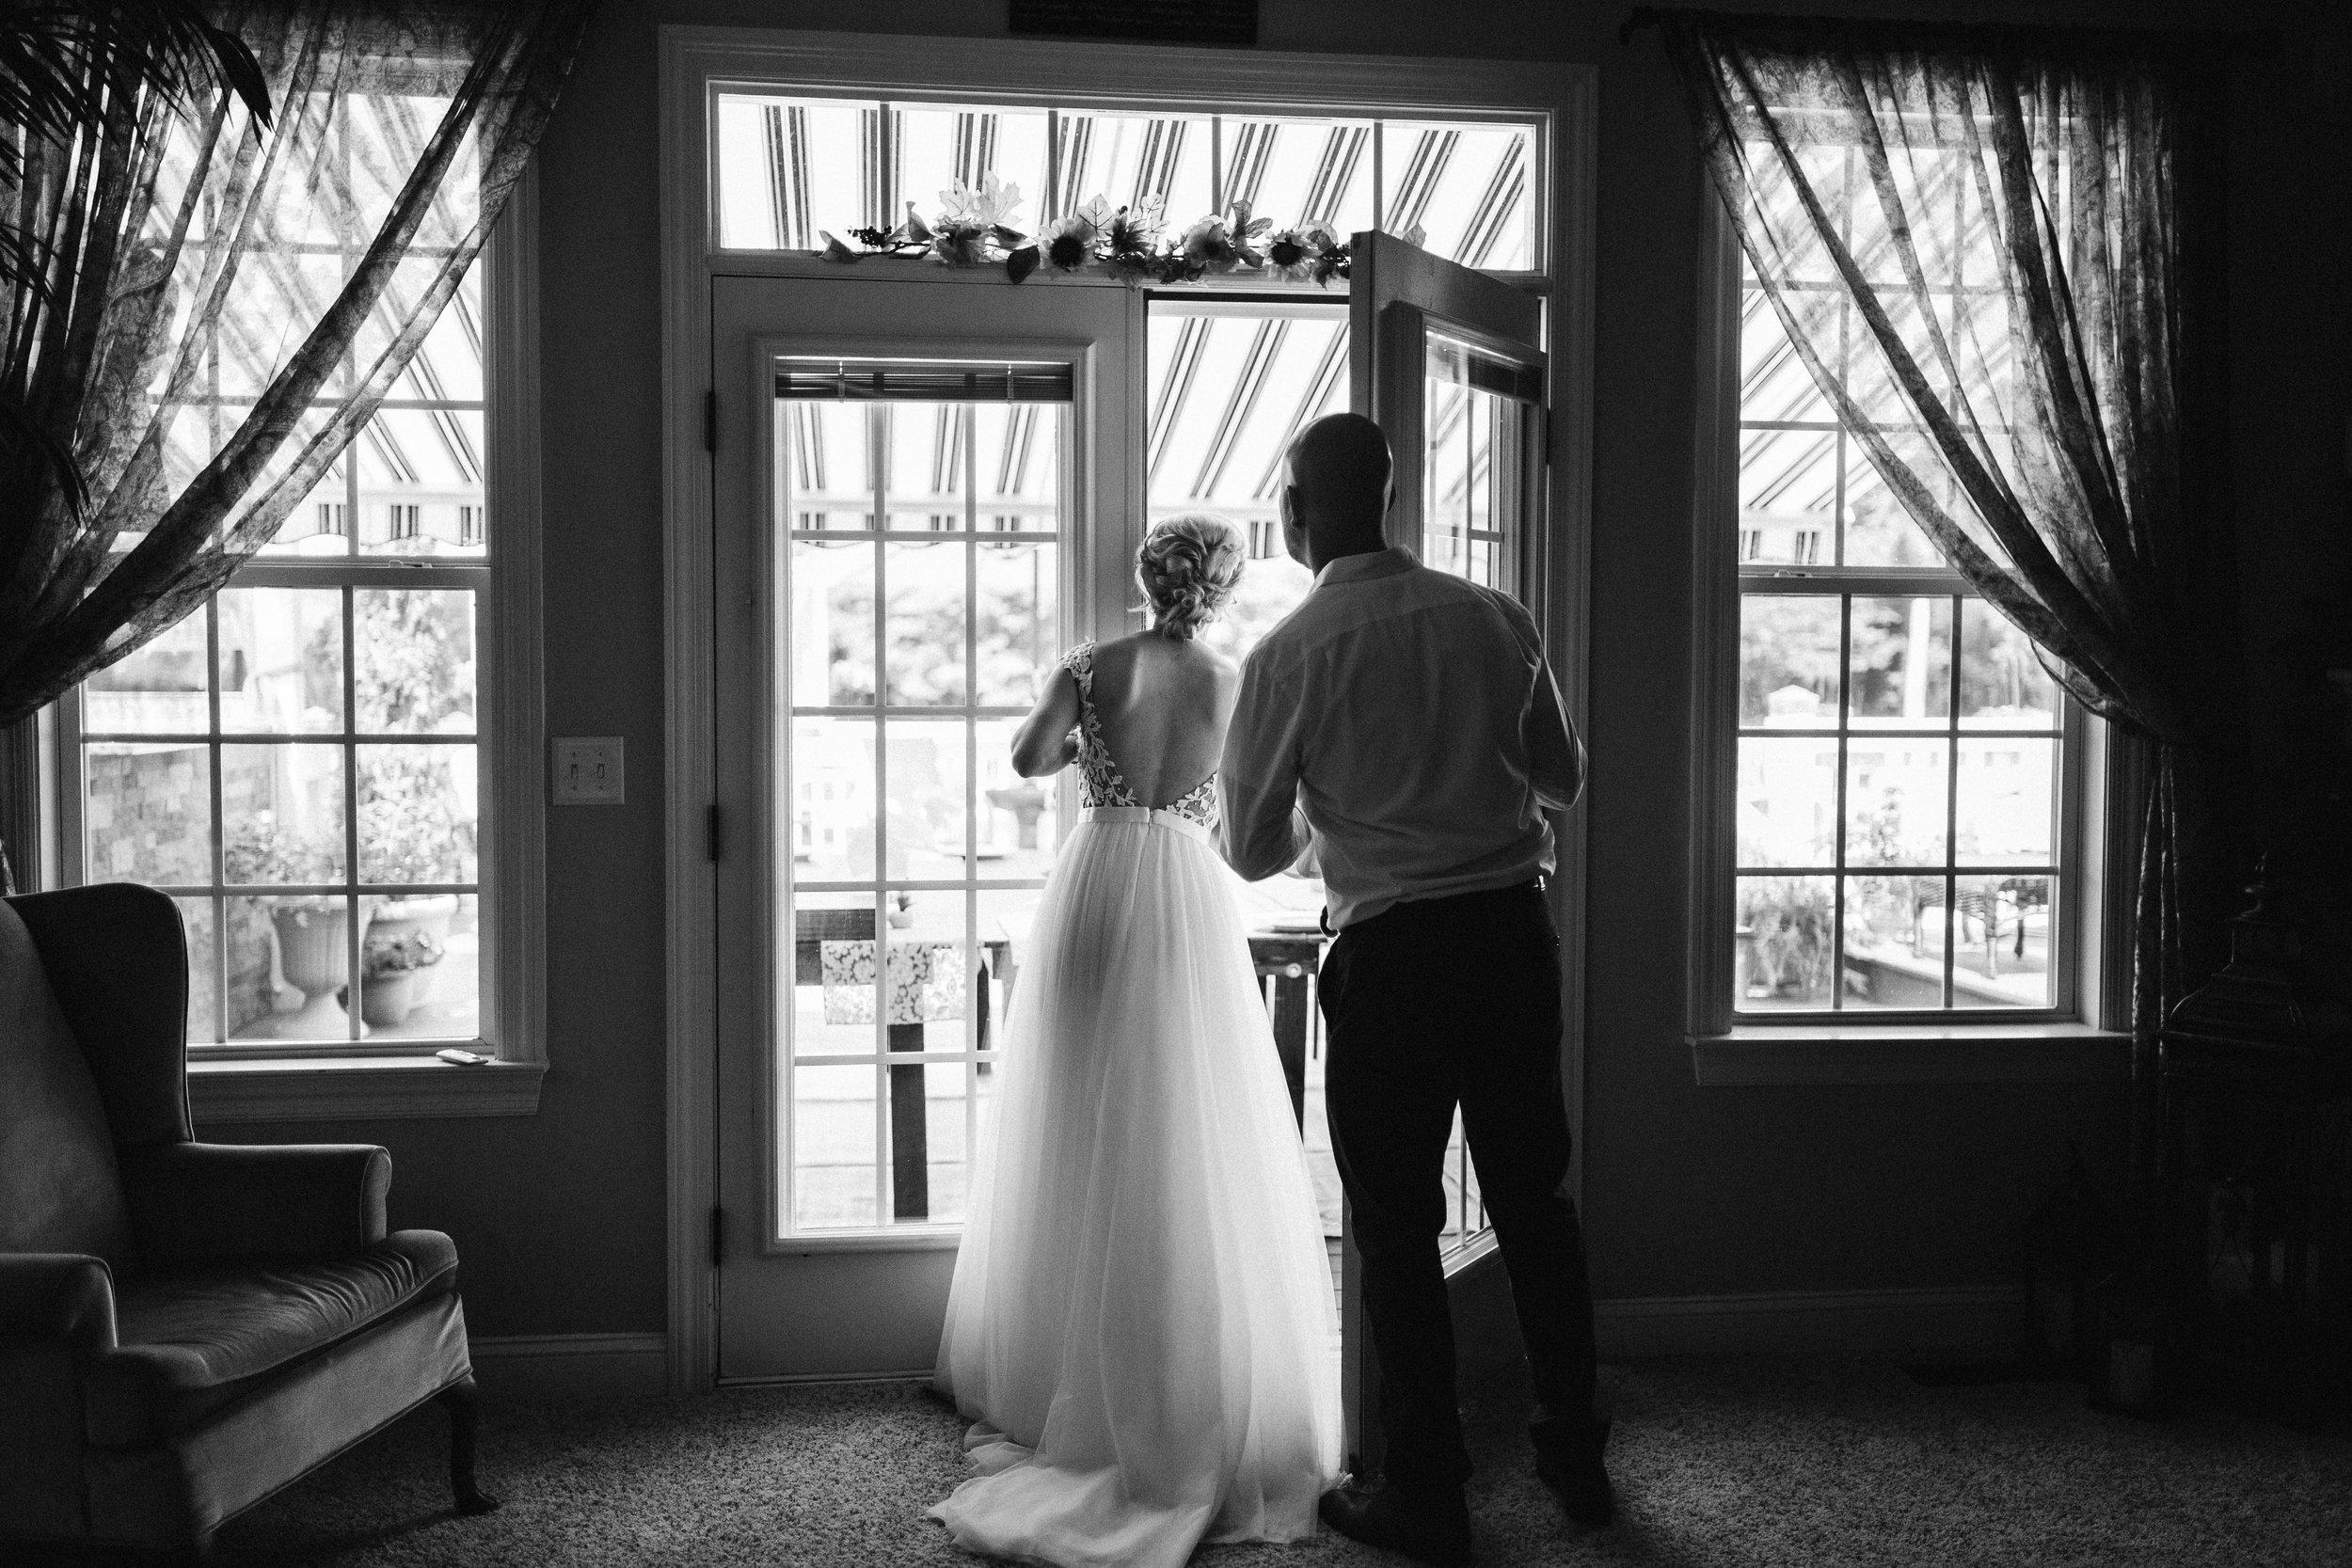 2018.09.02 Ray and Sarah Prizner Nashville TN Wedding FINALS-166.jpg